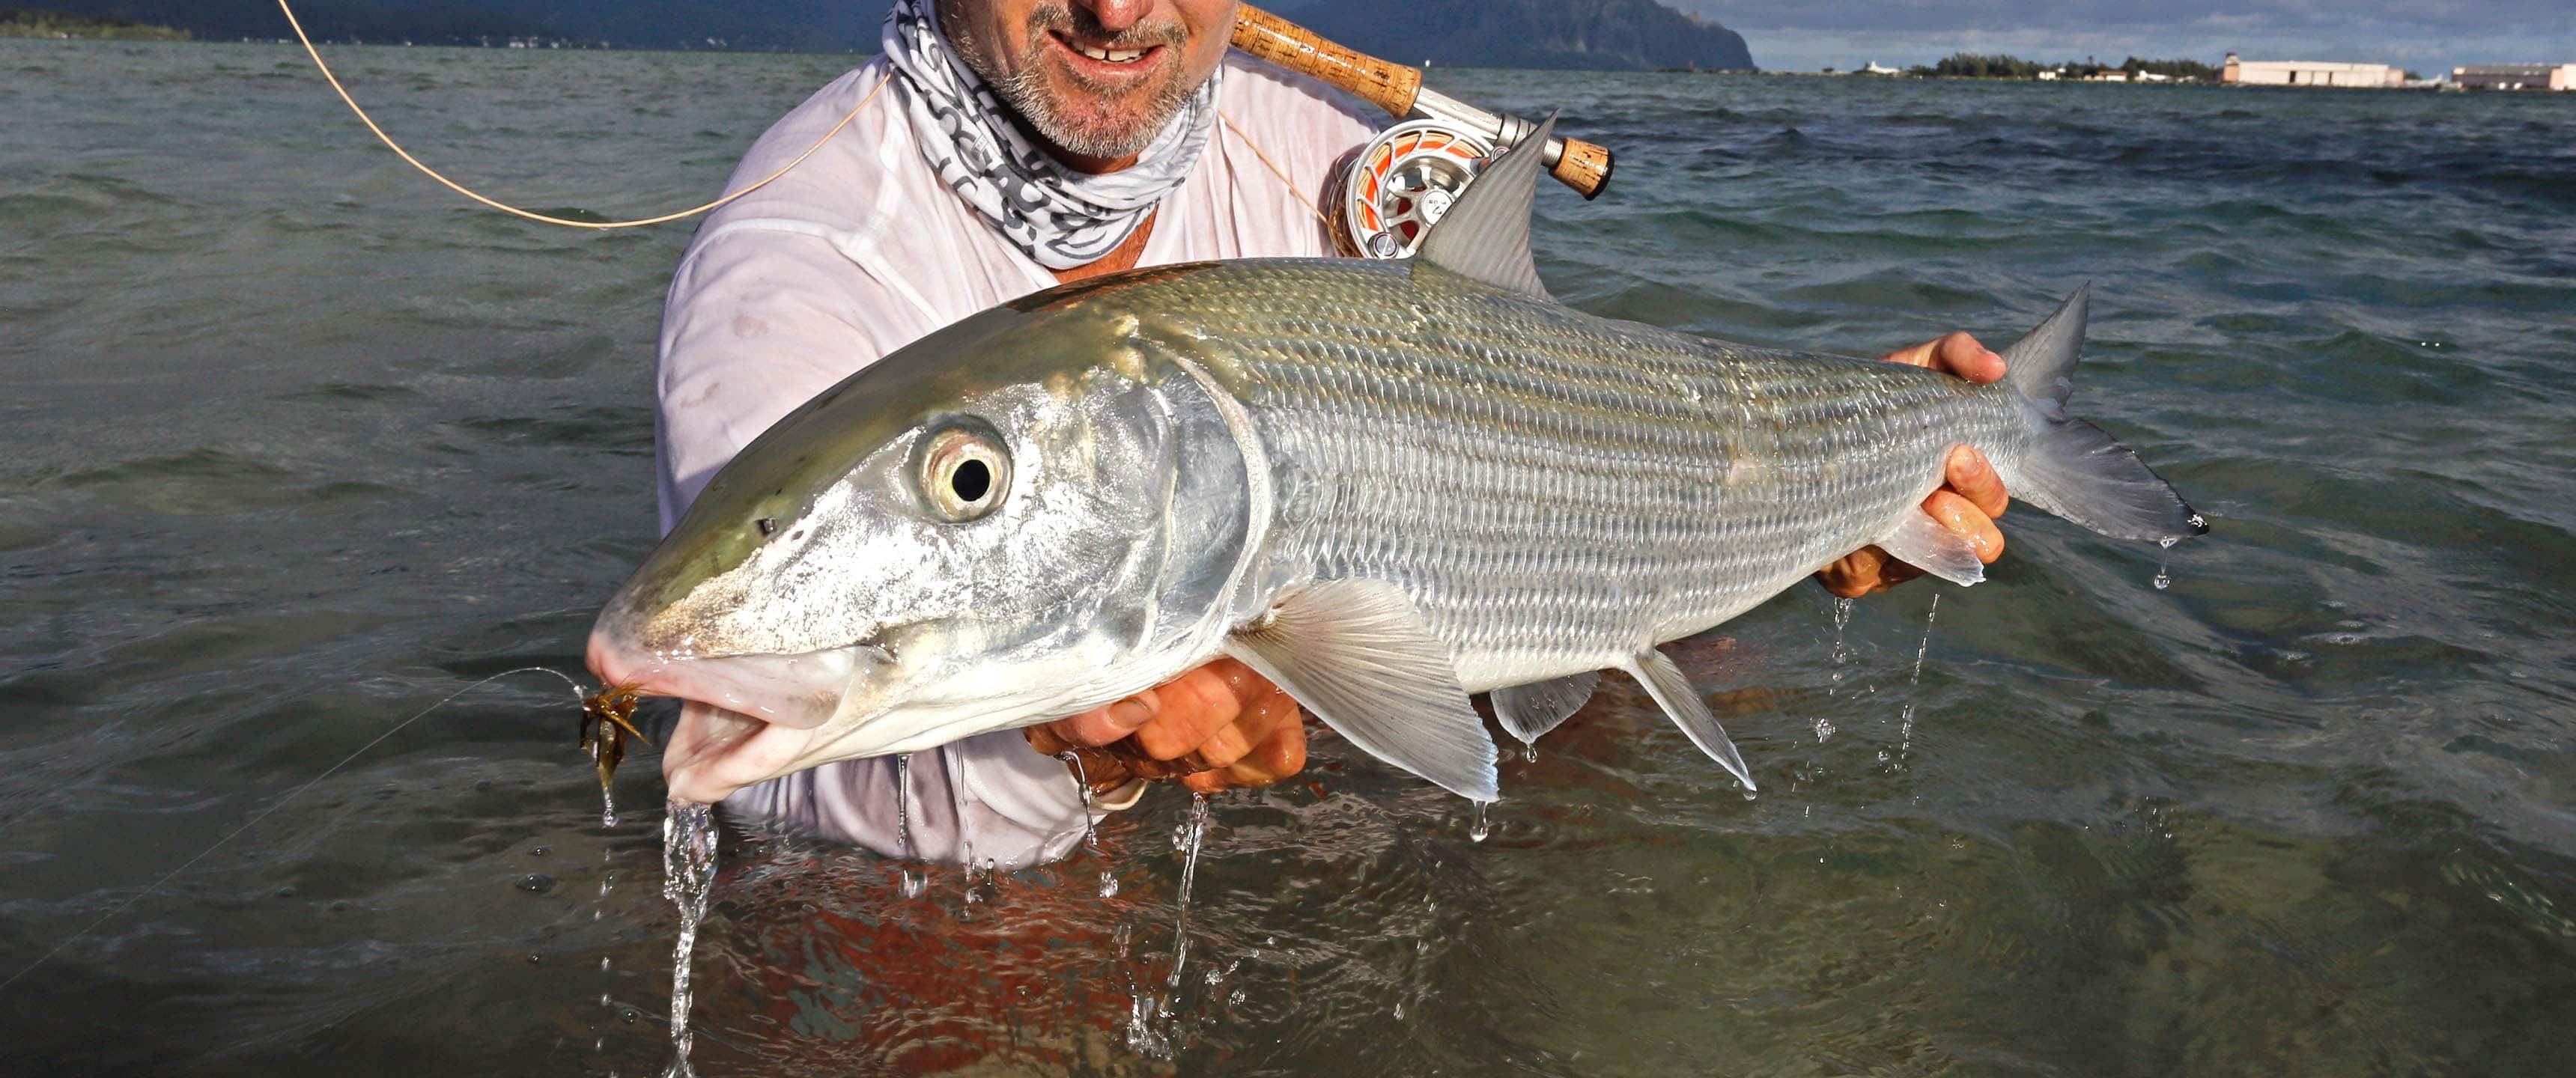 Hawaii fly fishing guide bonefish hawaii captain rick lee for Bonefish fly fishing